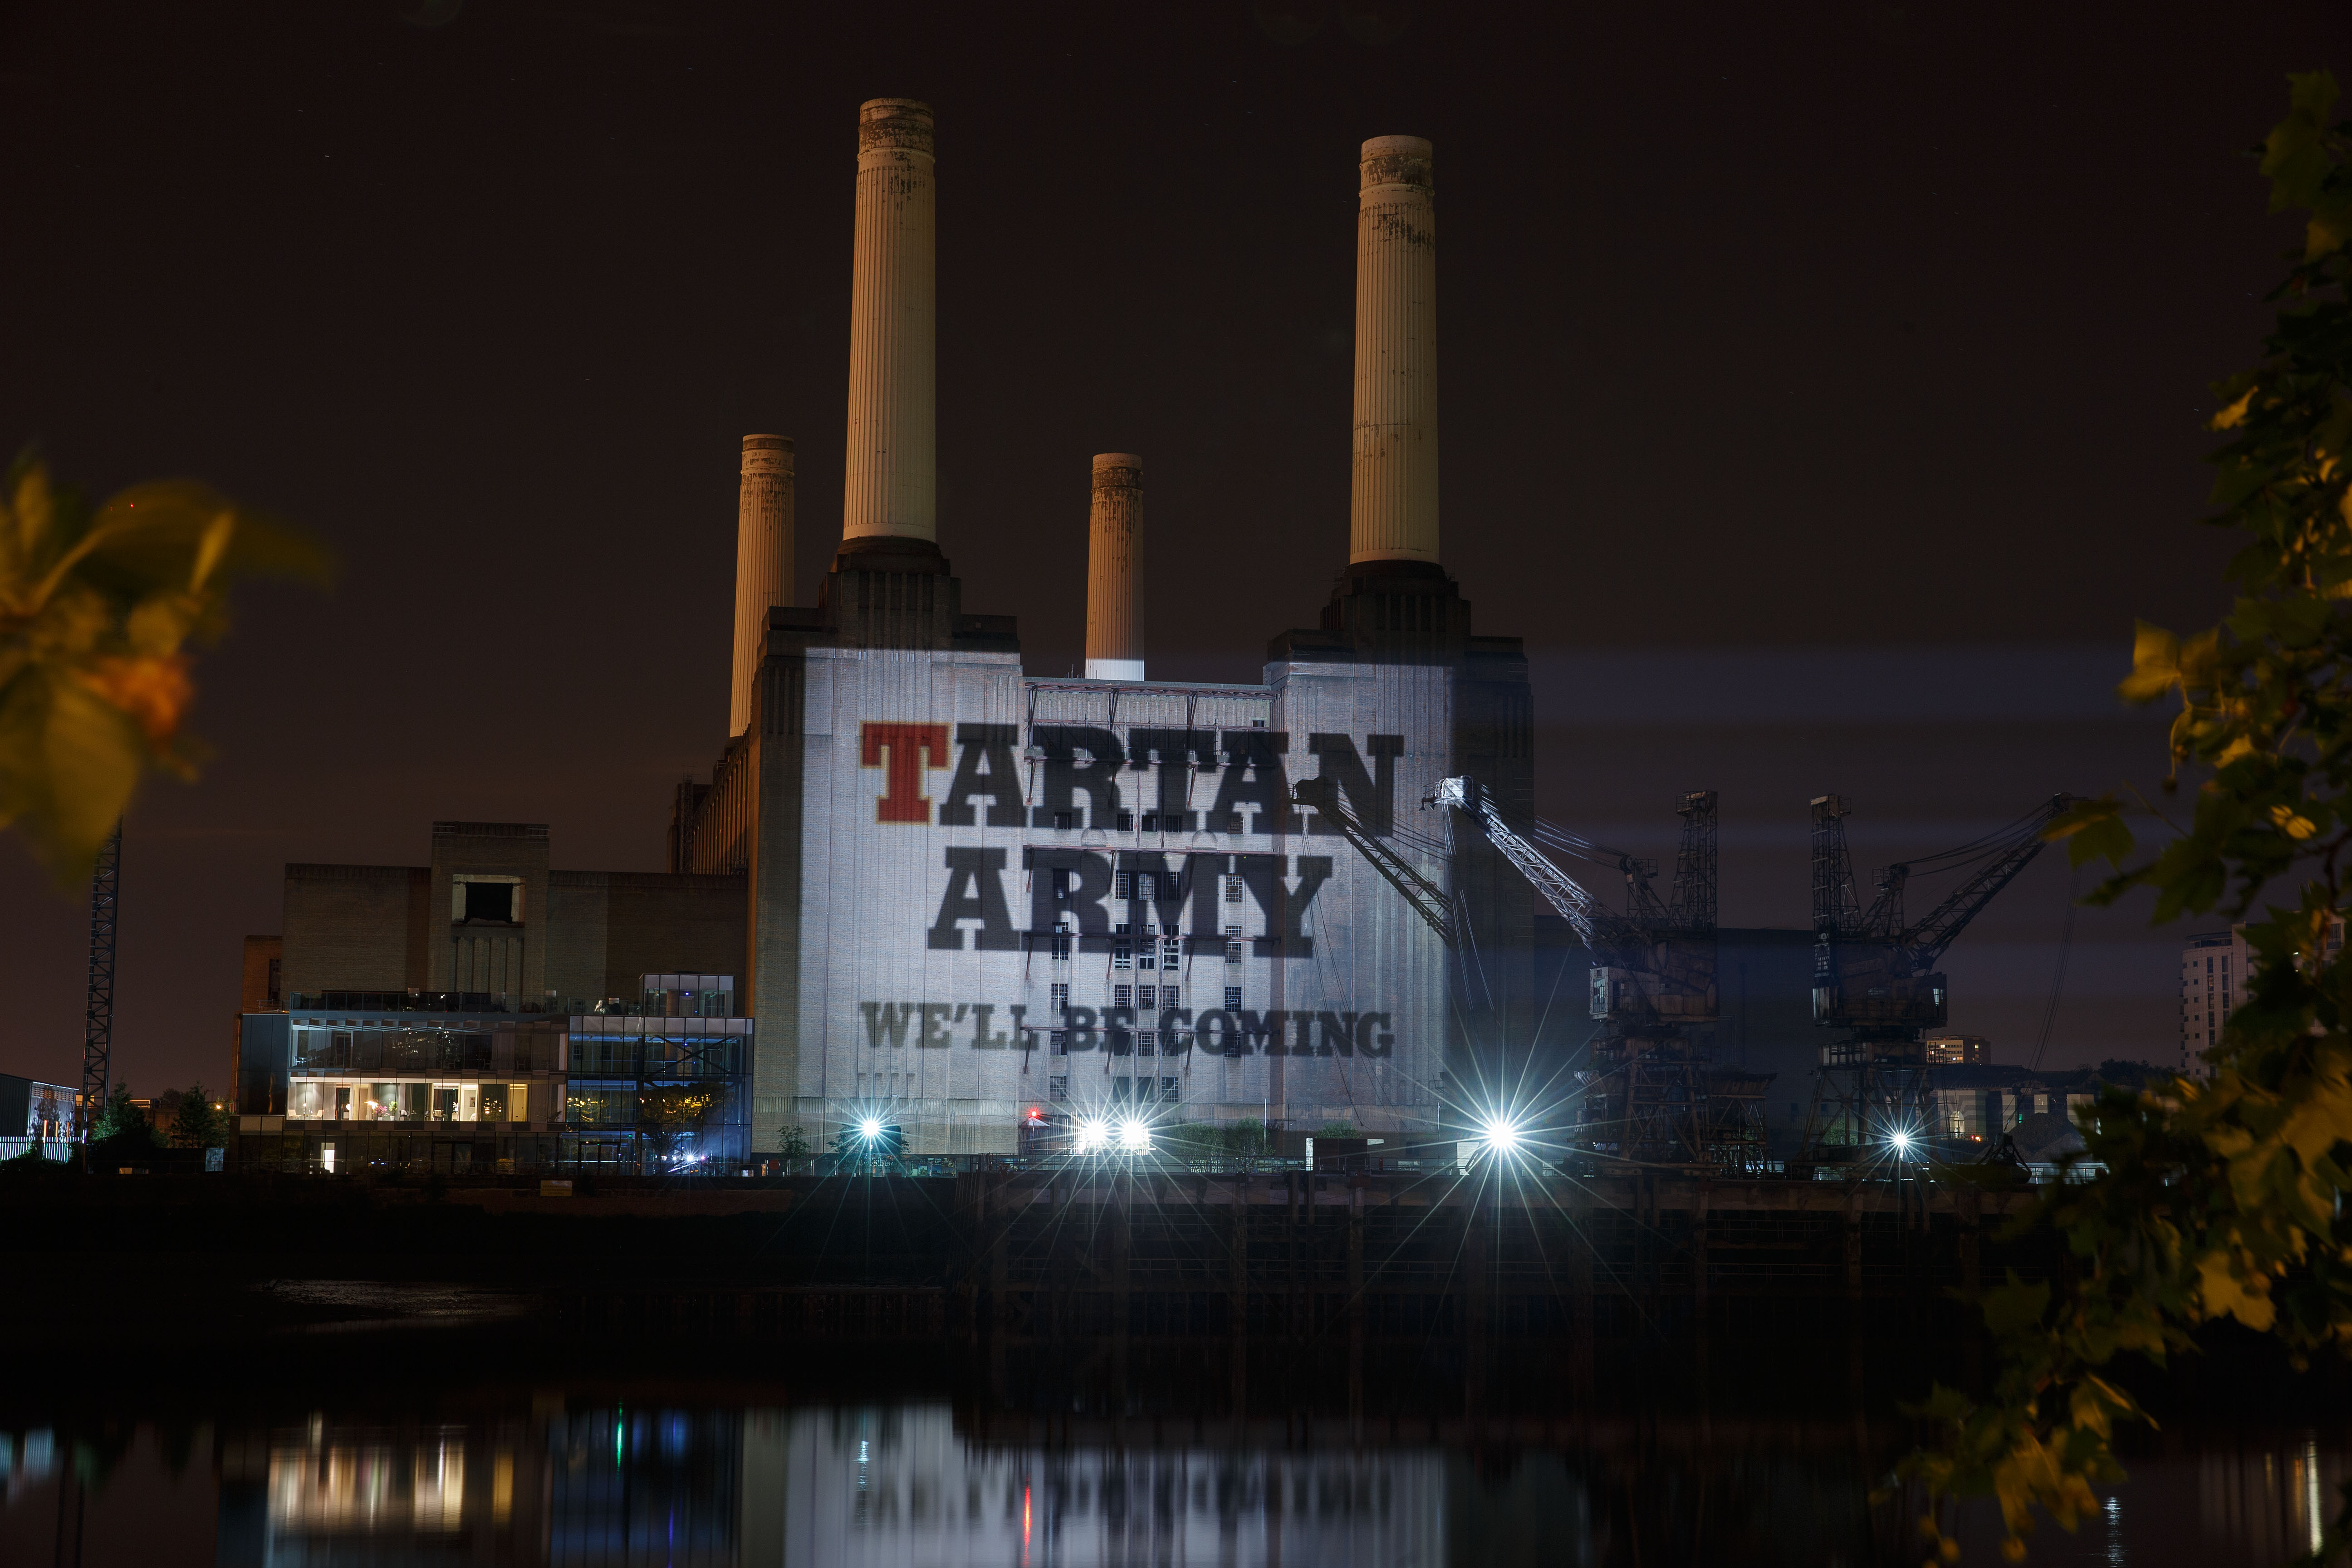 TARTAN ARMY PROJECTIONS BATTERSEA POWER STATION